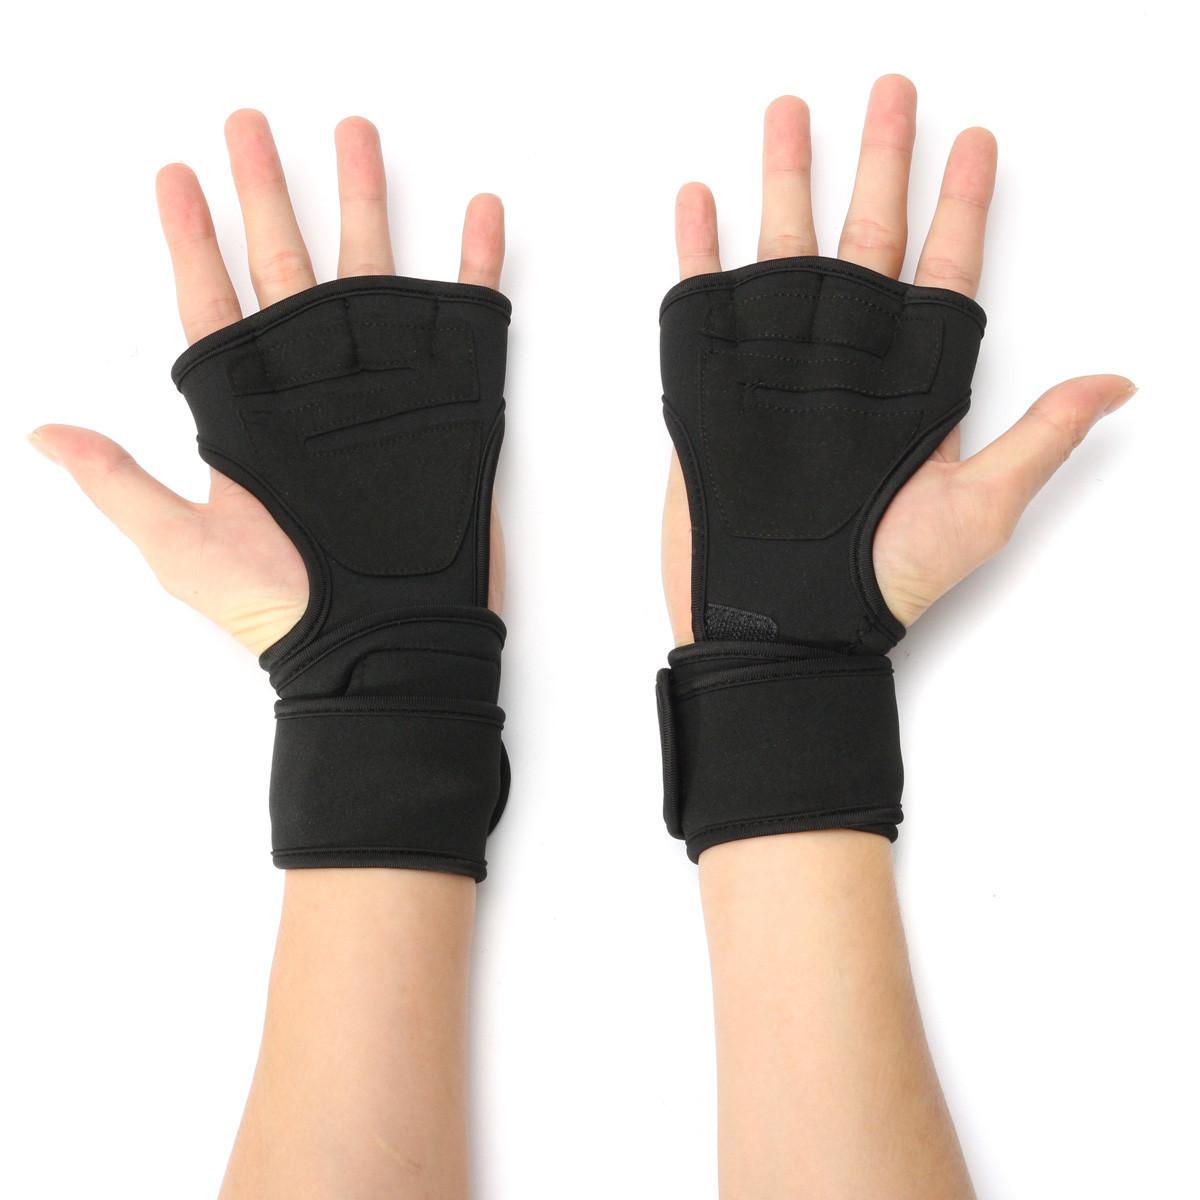 M angkat berat kebugaran olahraga sarung tangan latihan latihan olahraga pergelangan tangan bungkus .